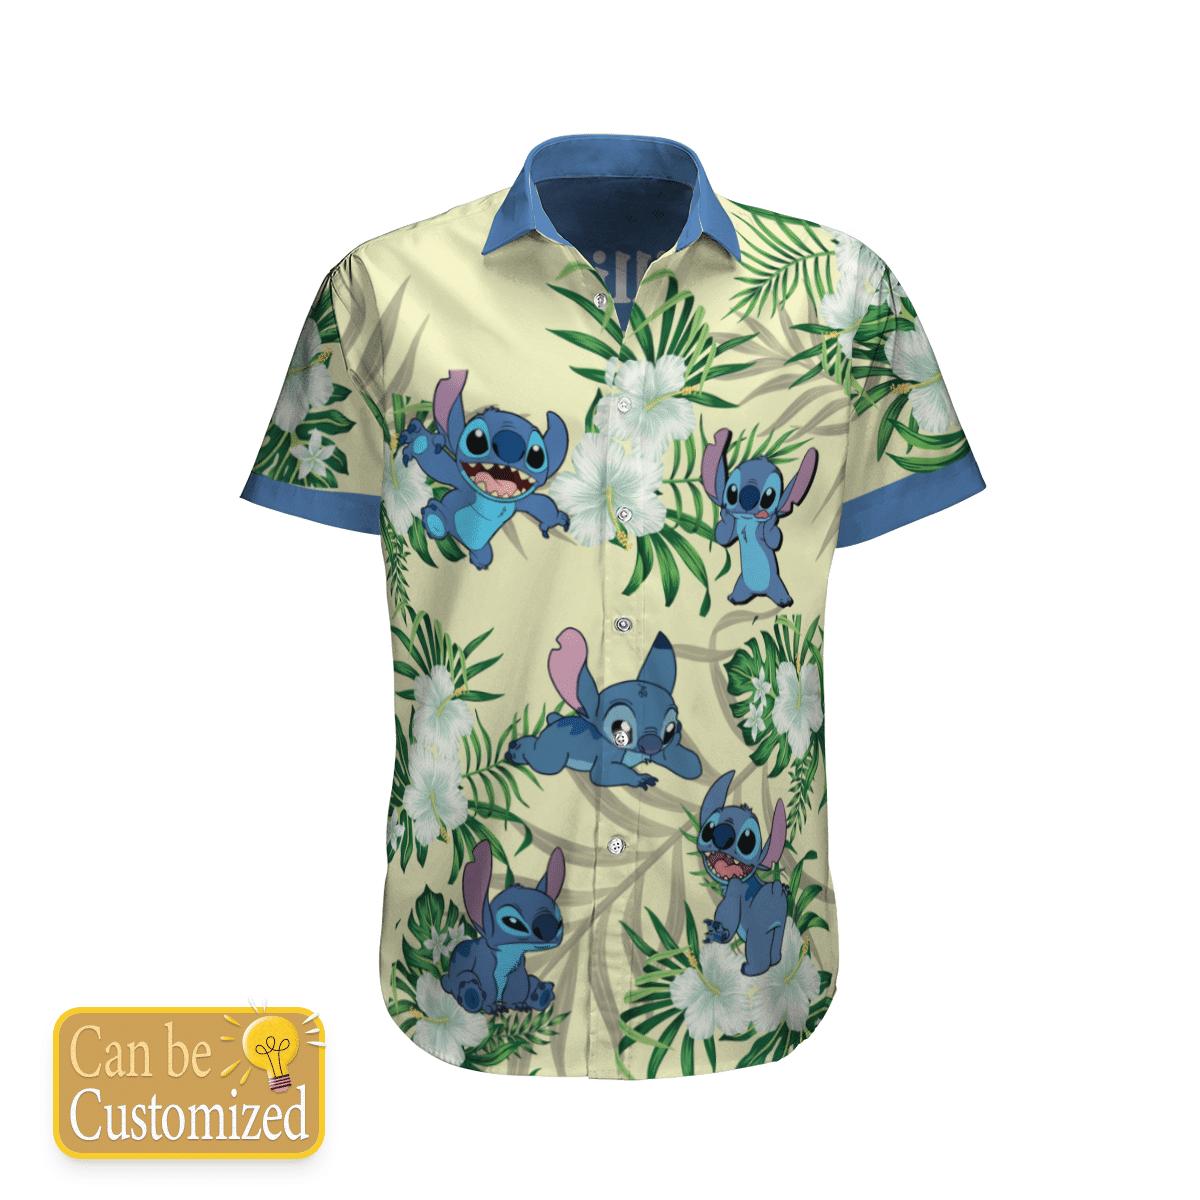 Personalized Stitch Flower Hawaiian Shirt Summer Shirt